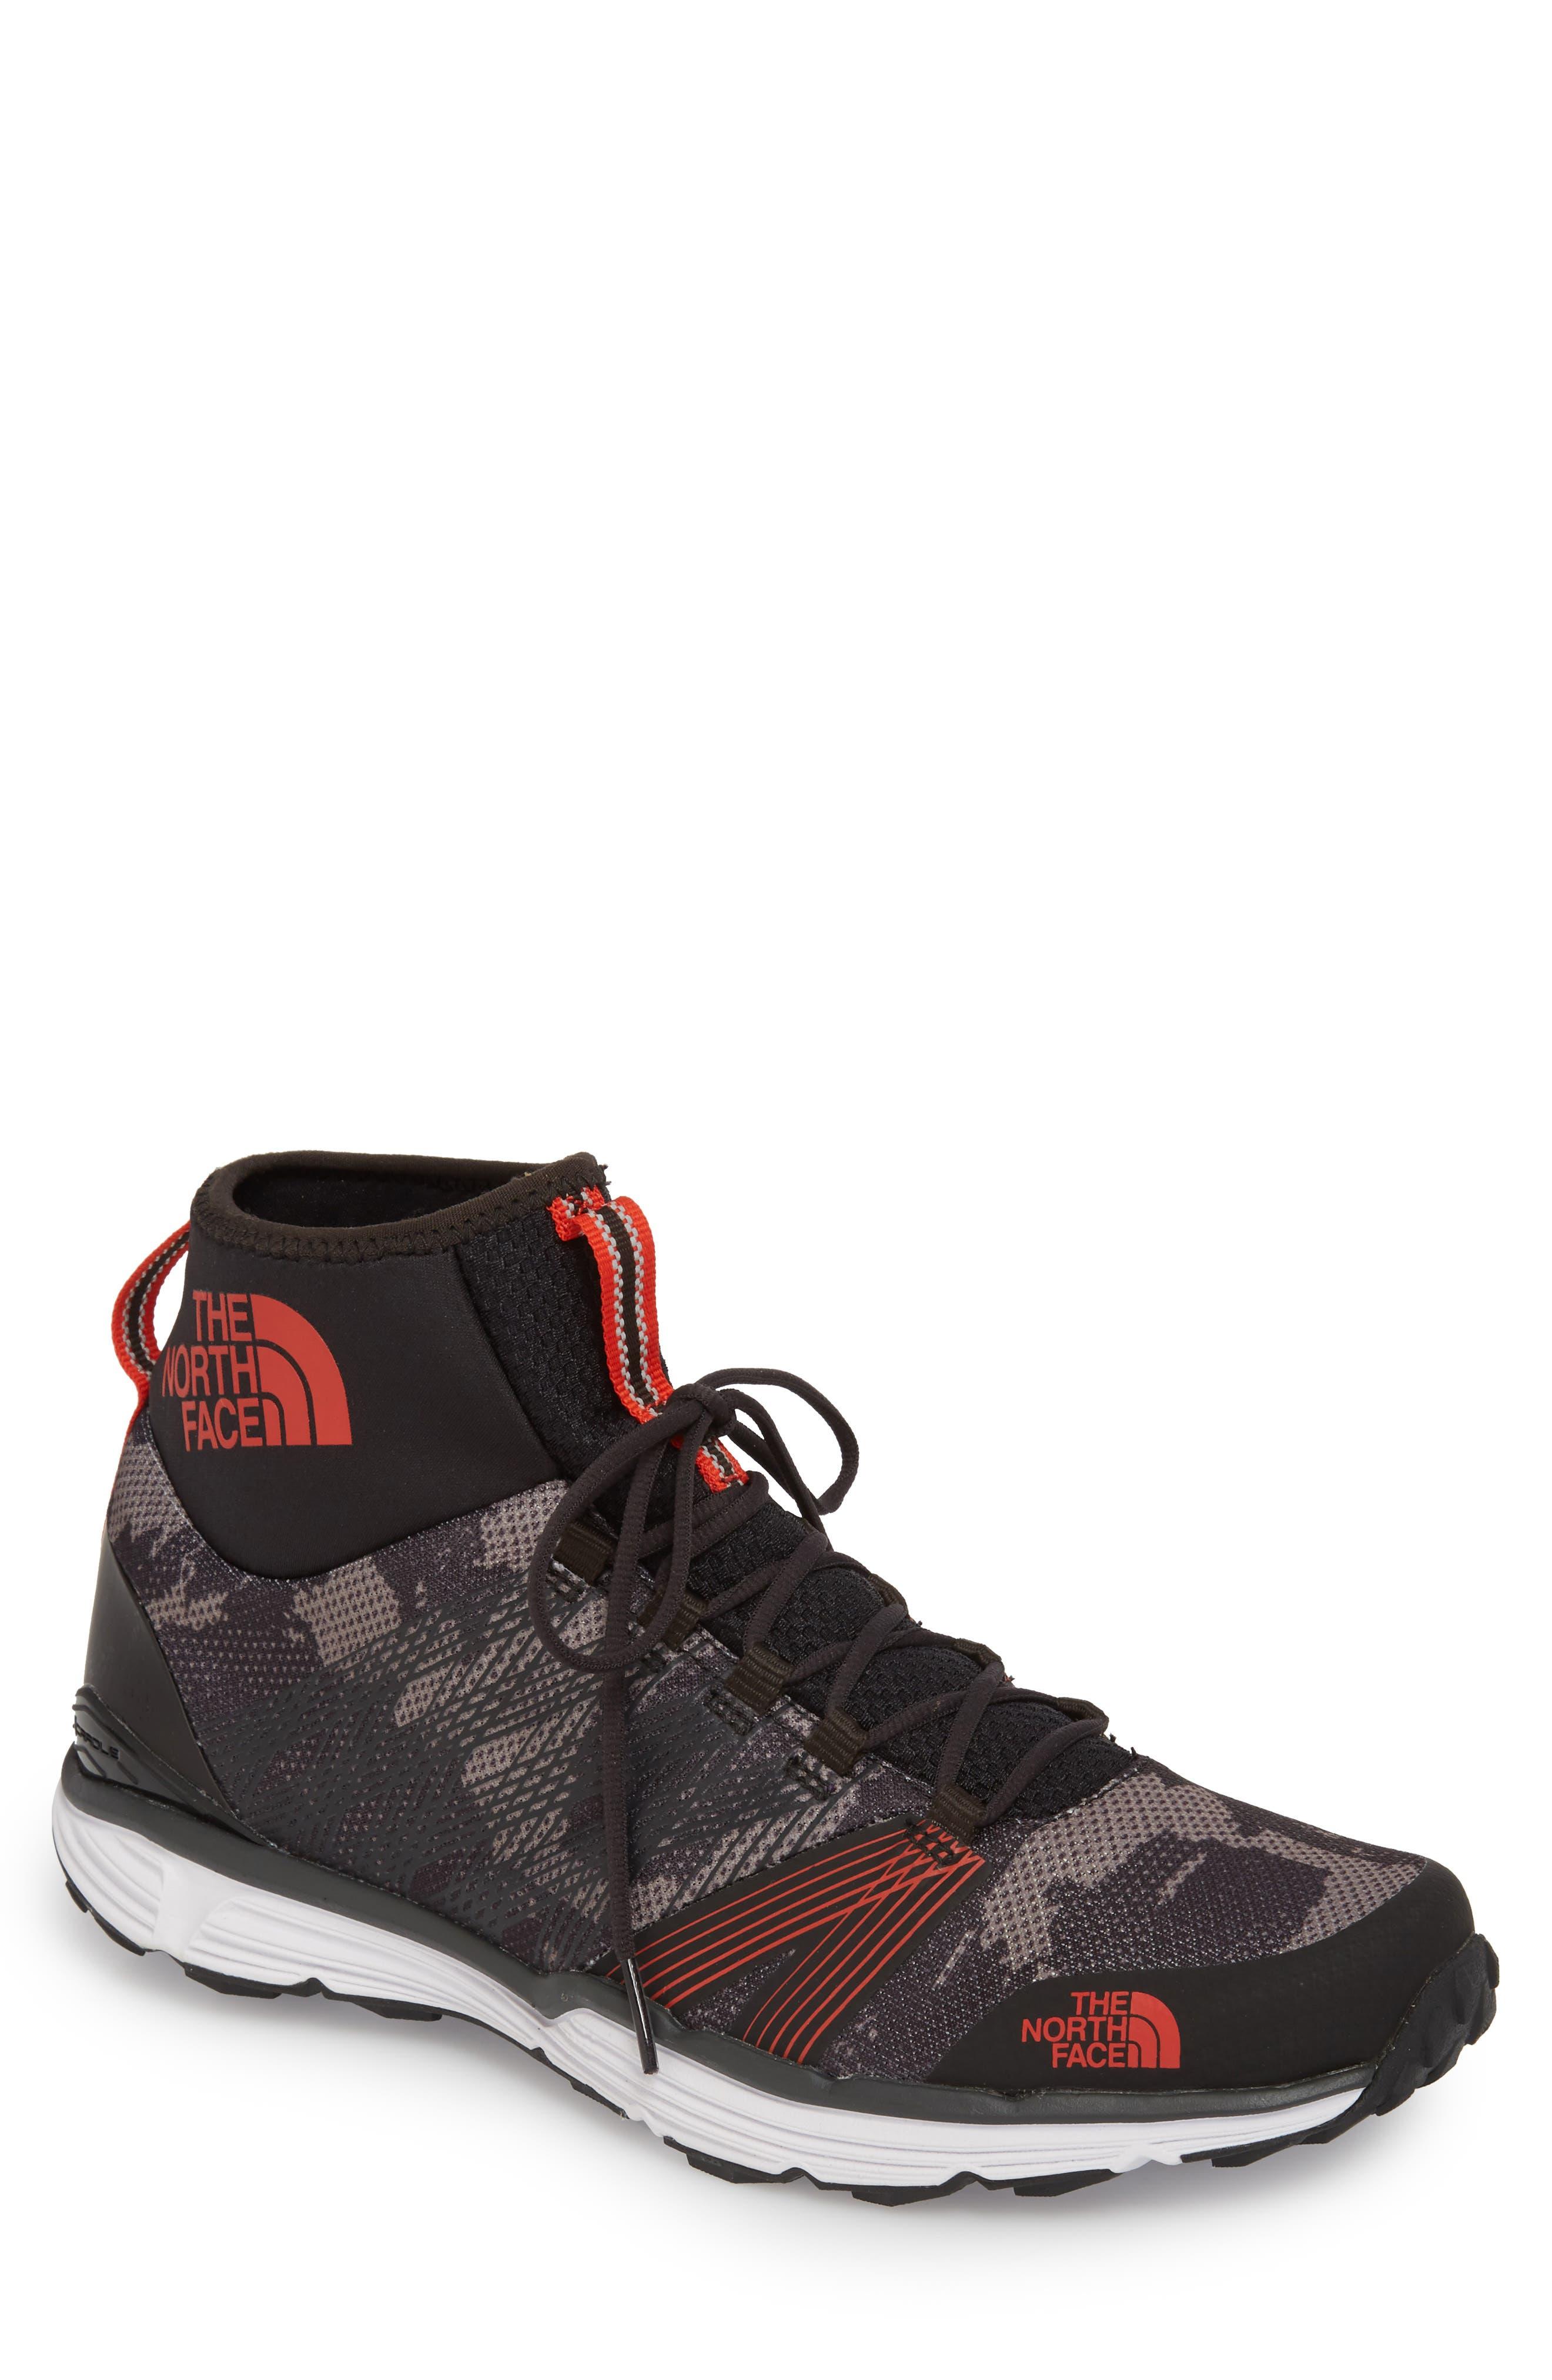 Litewave Ampere II Sneaker,                         Main,                         color,